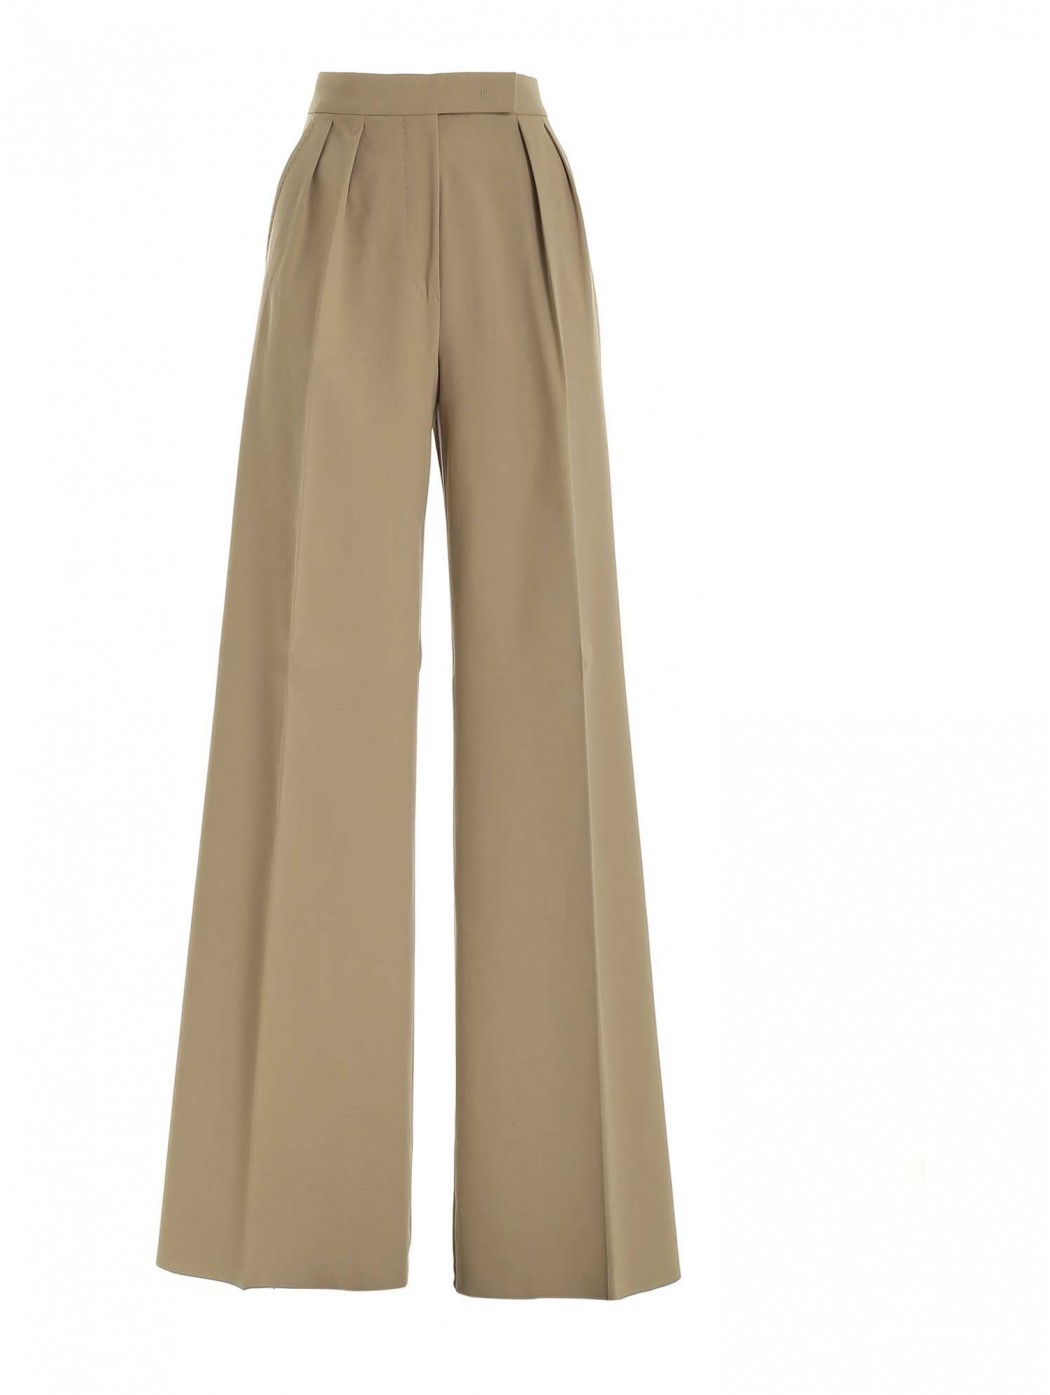 Pantalone Malizia chino beige MAX MARA 11311118600 001